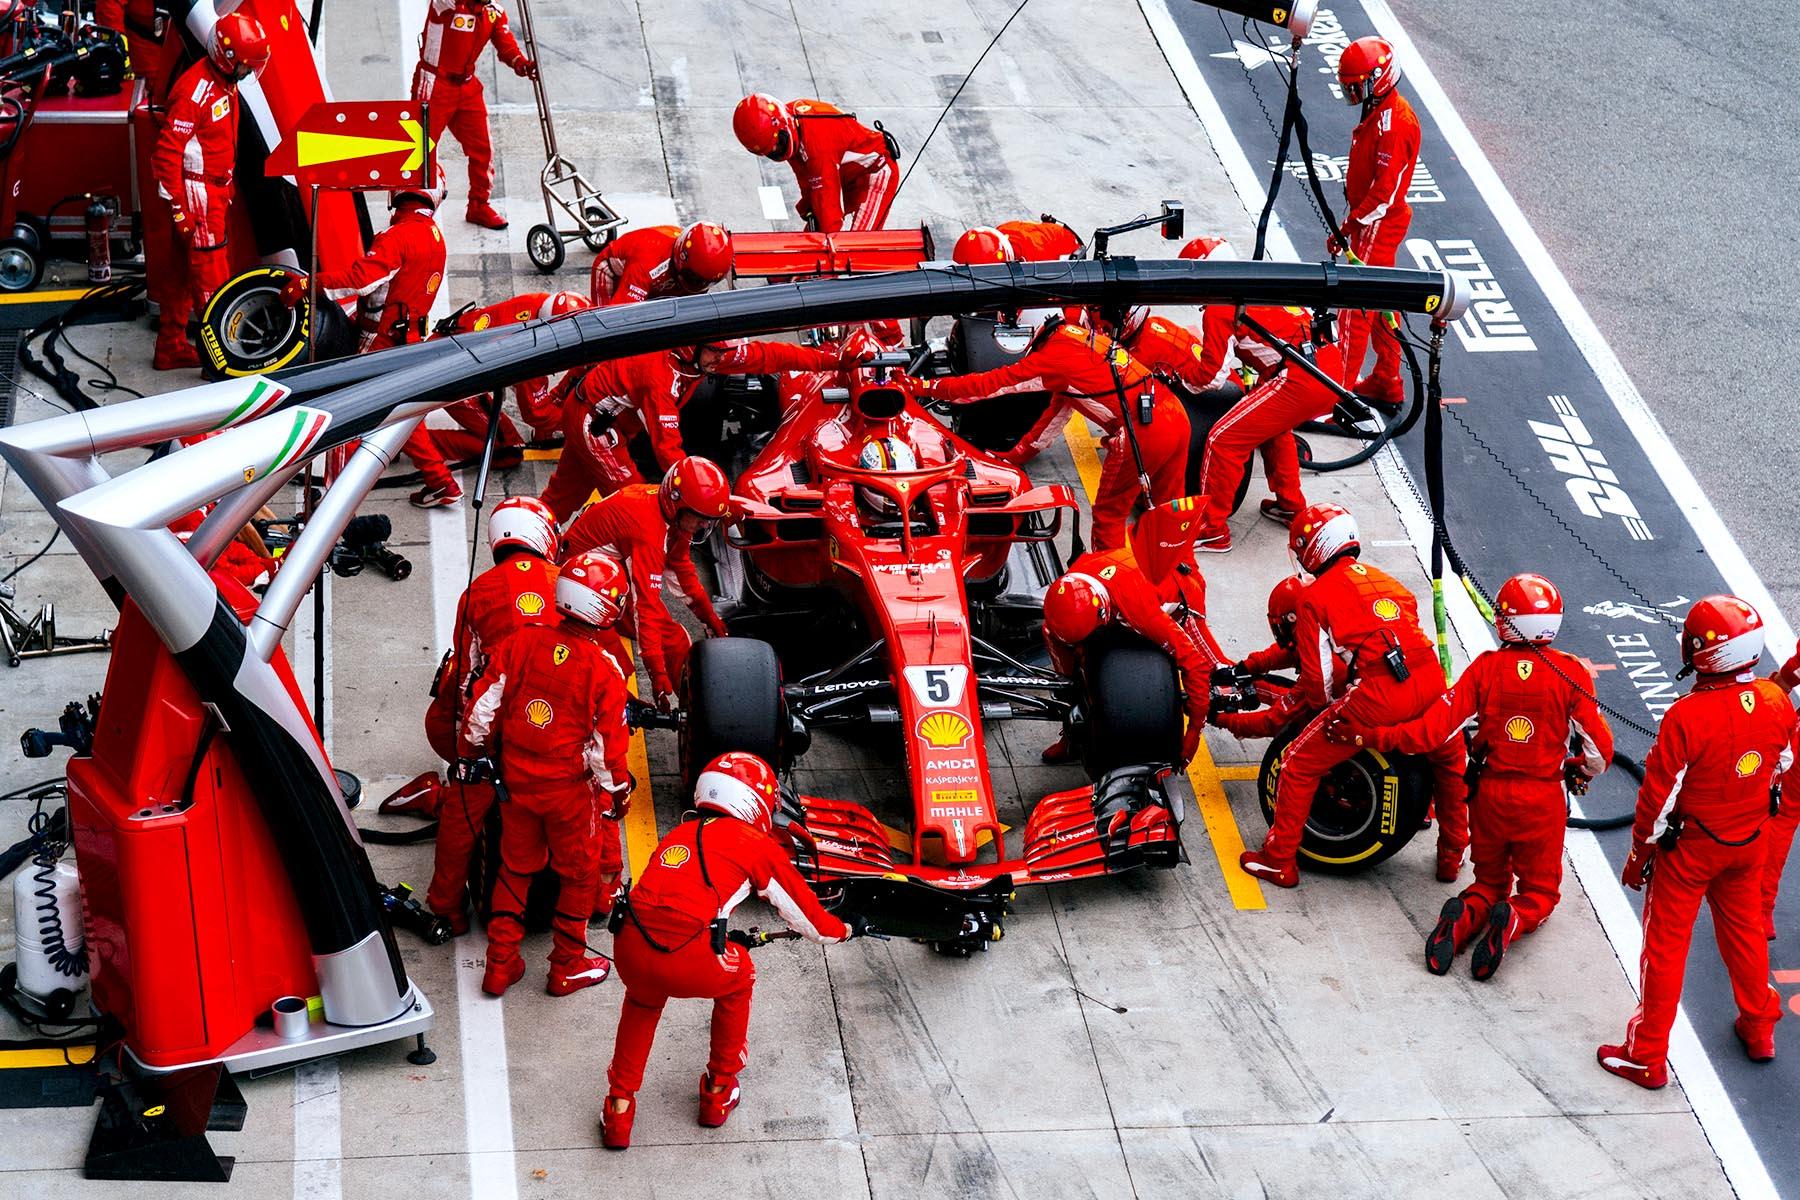 Sebastian Vettel in his pit box at the 2018 Italian Grand Prix.